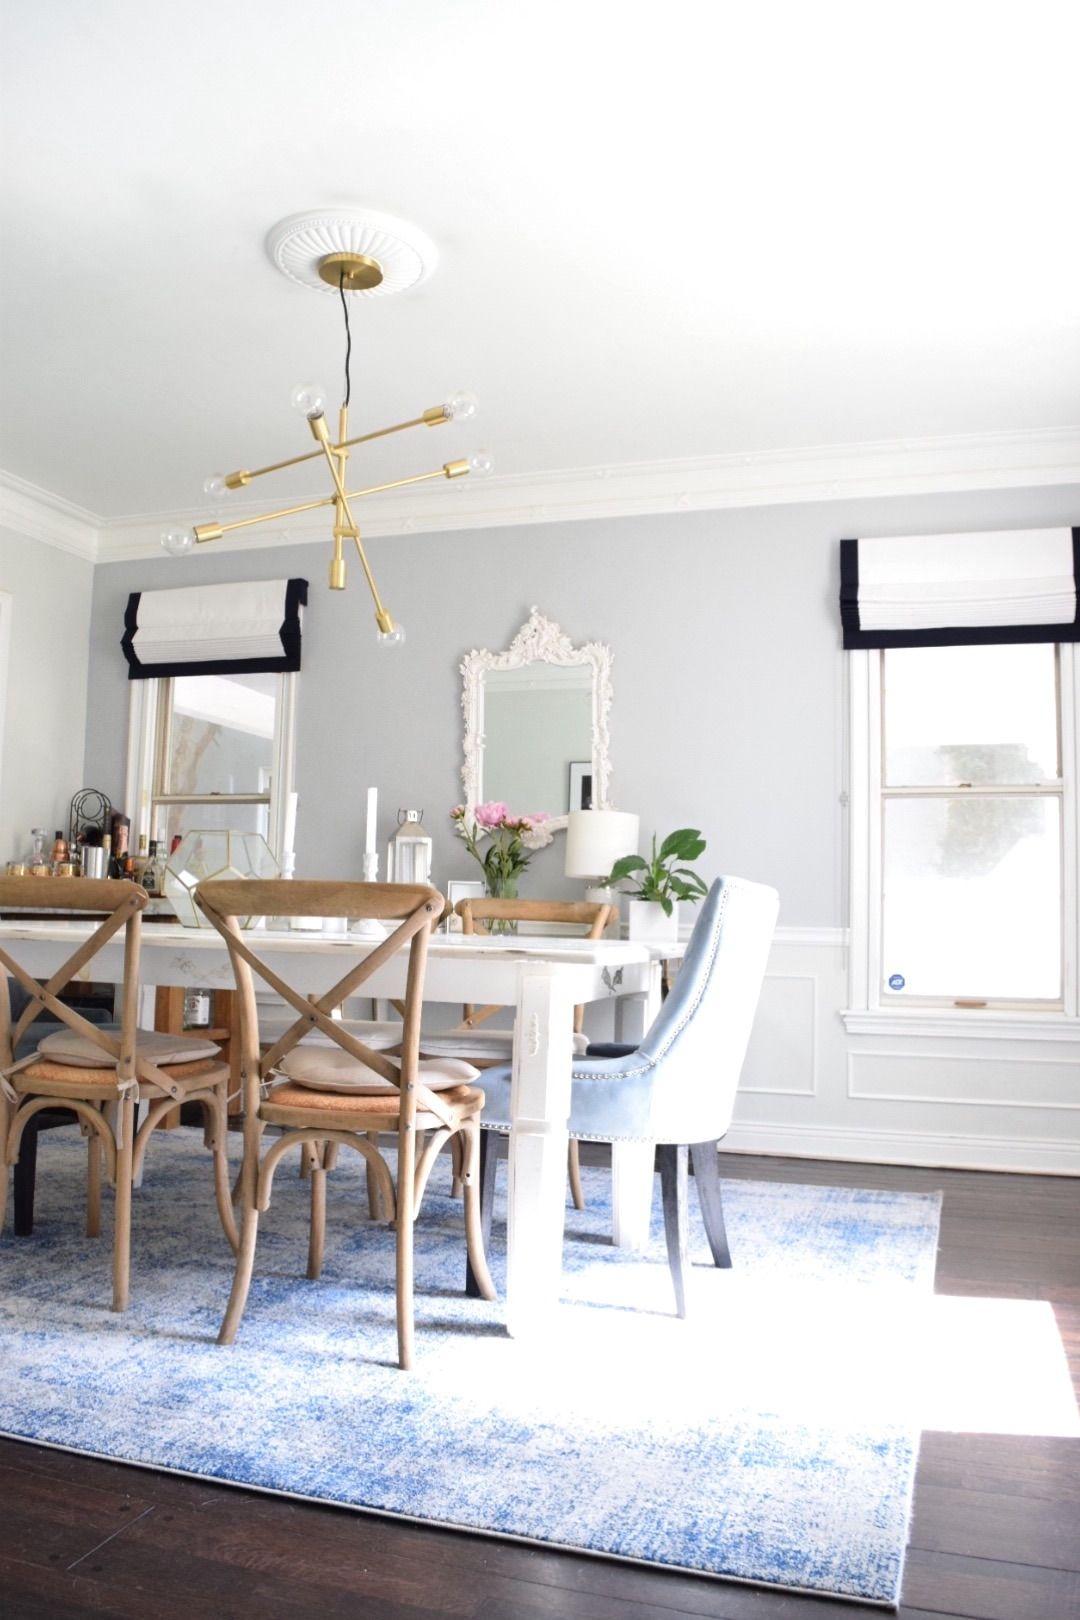 The Shade Store Roman Shades   Dining Room Renovation! Blue Coastal Chic |  The Beauty Blender By Danielle Cuccio